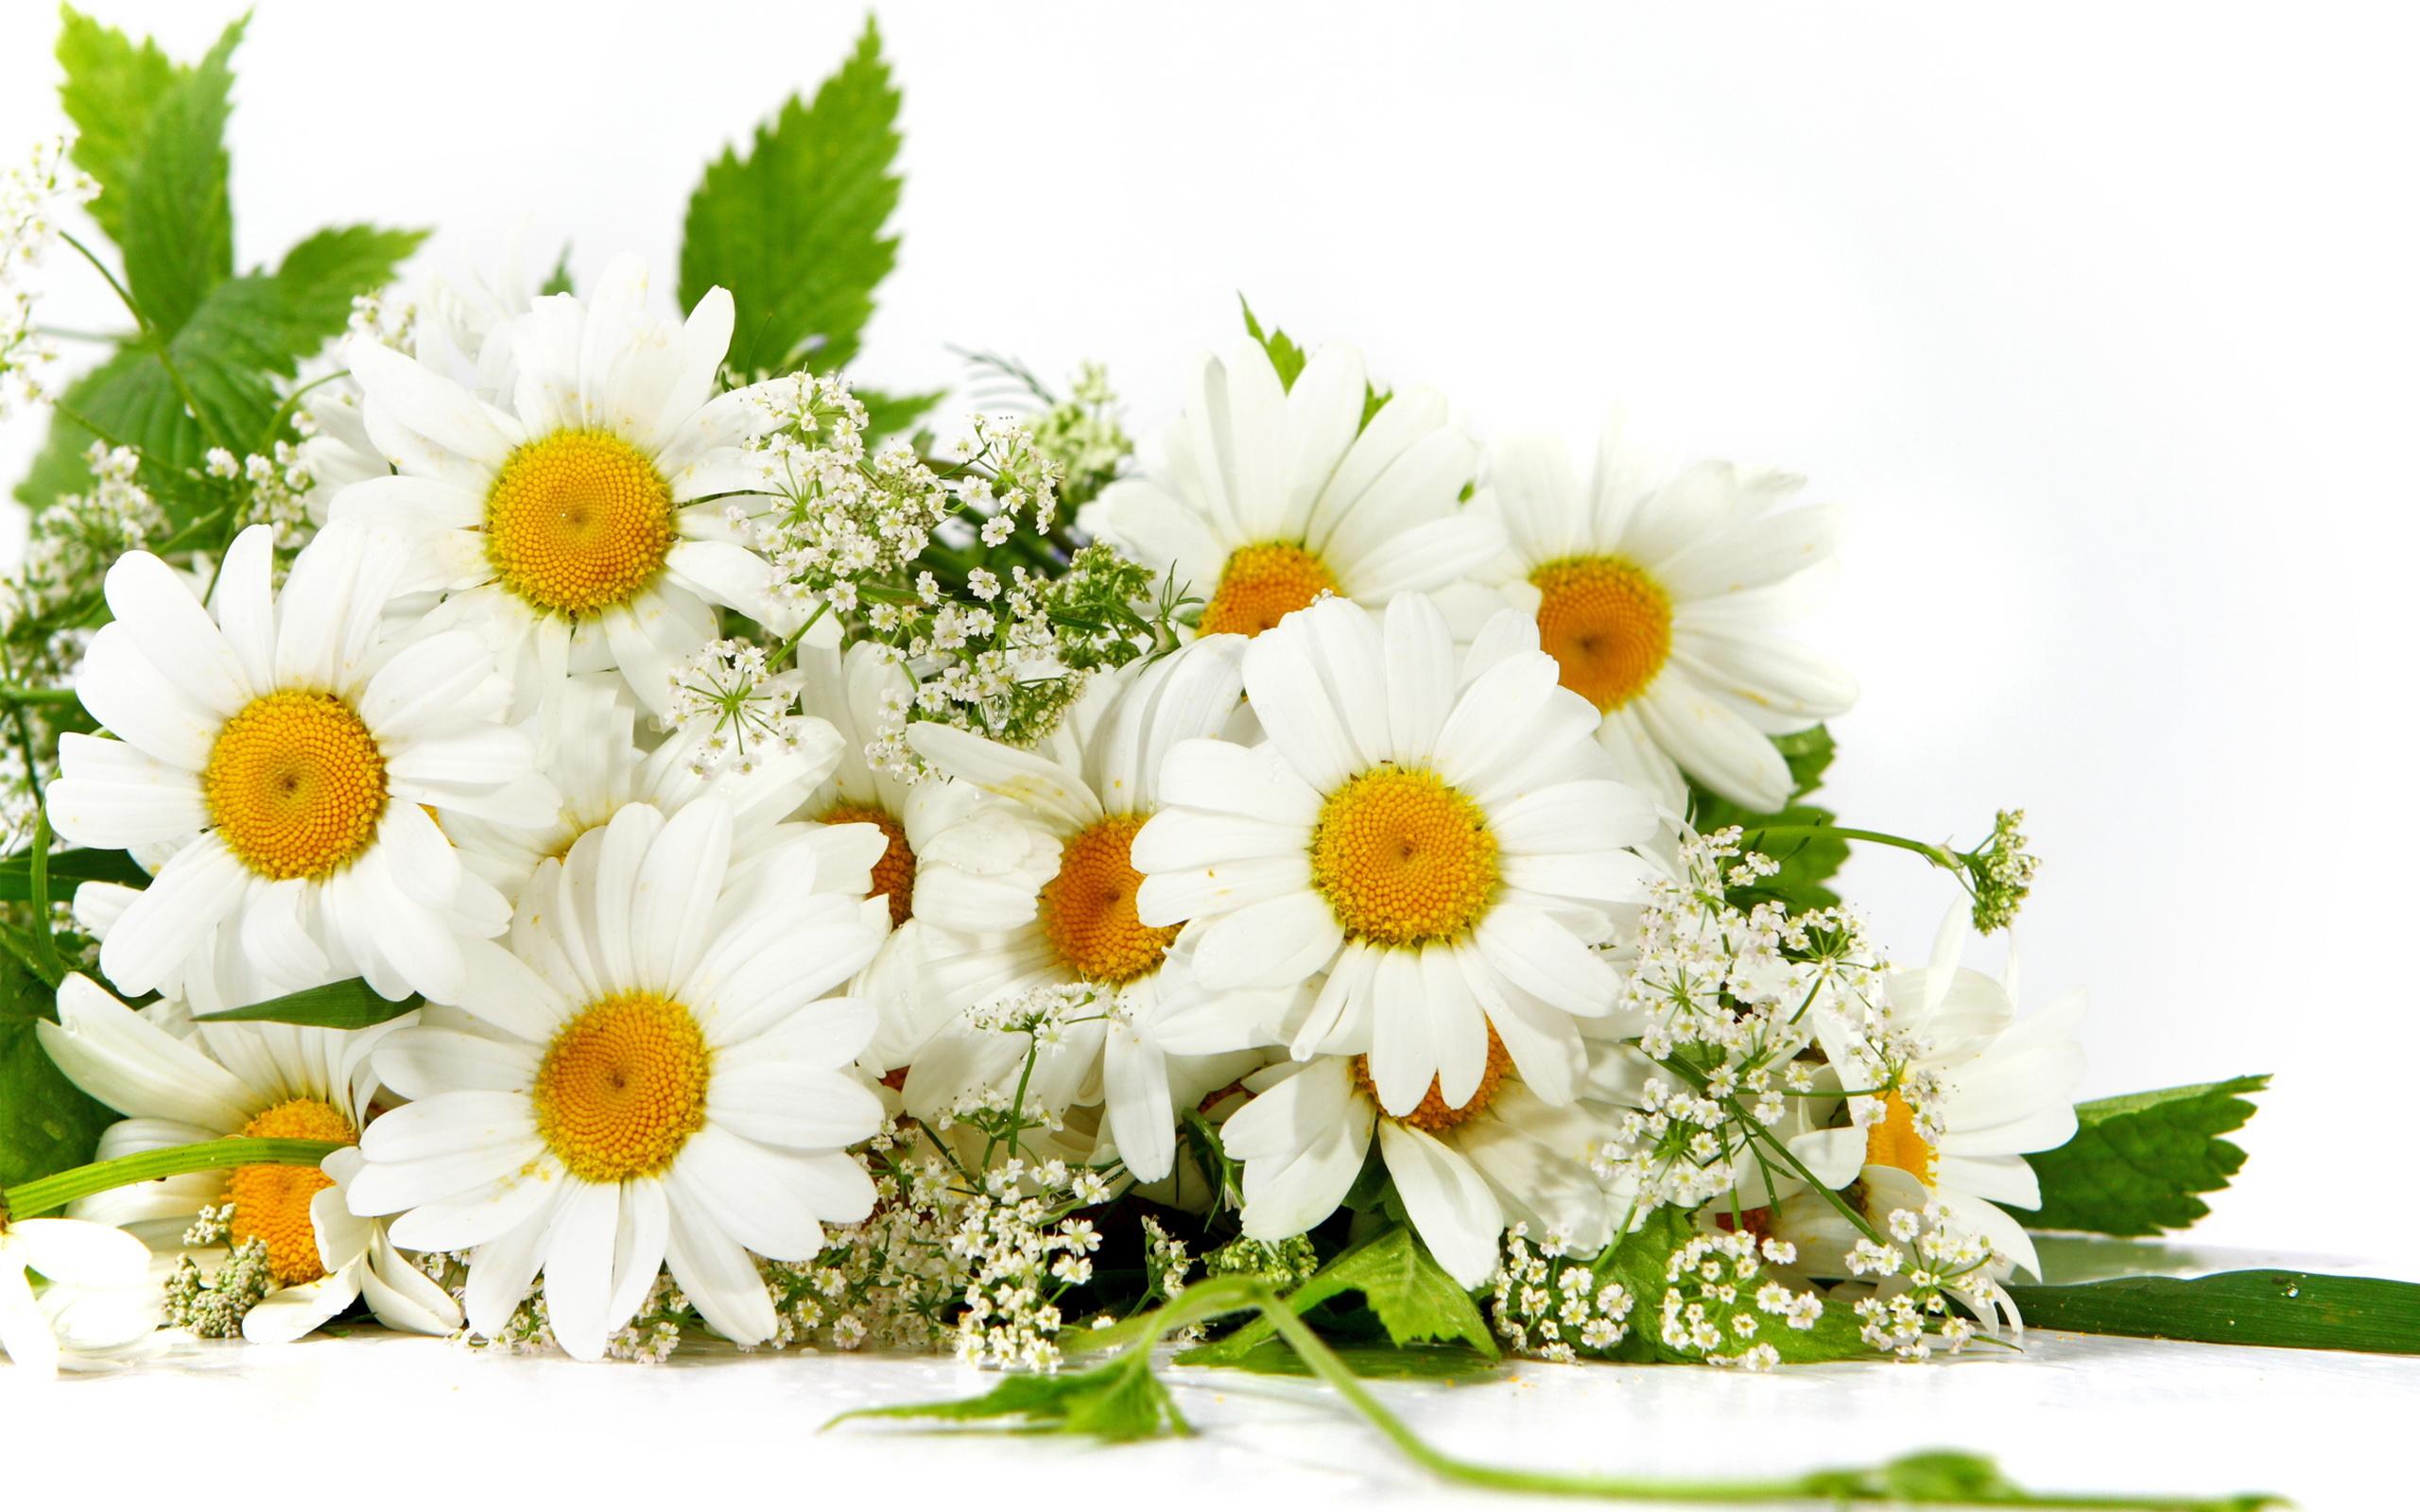 bouquet of daisy